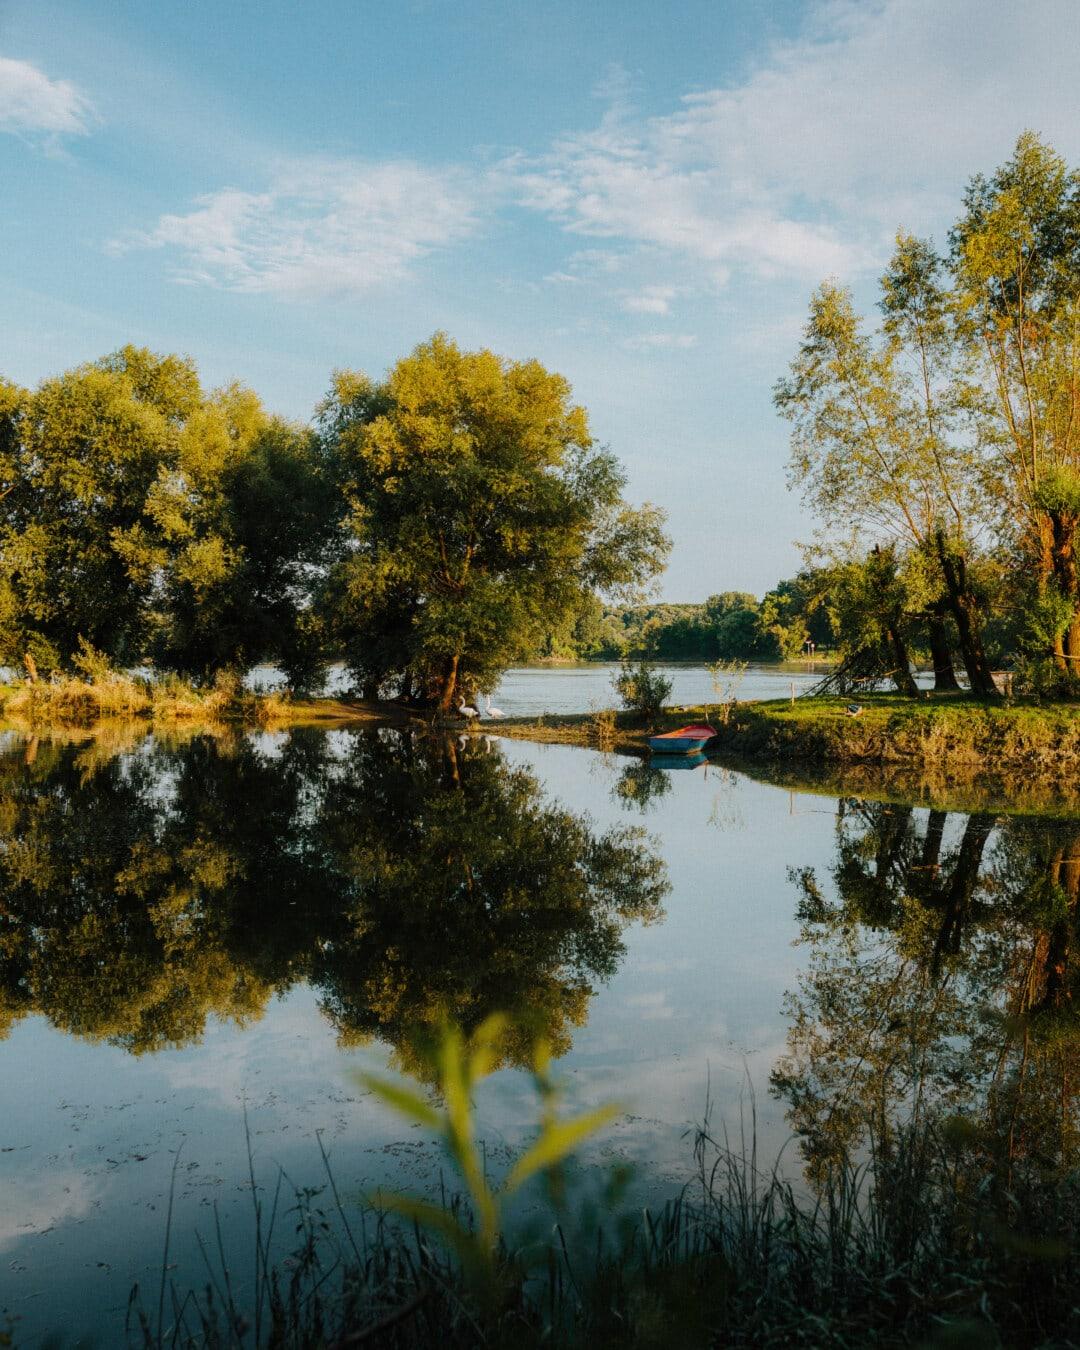 Natur, See, Reflexion, Struktur, Wasser, Landschaft, Fluss, Blatt, Park, im freien